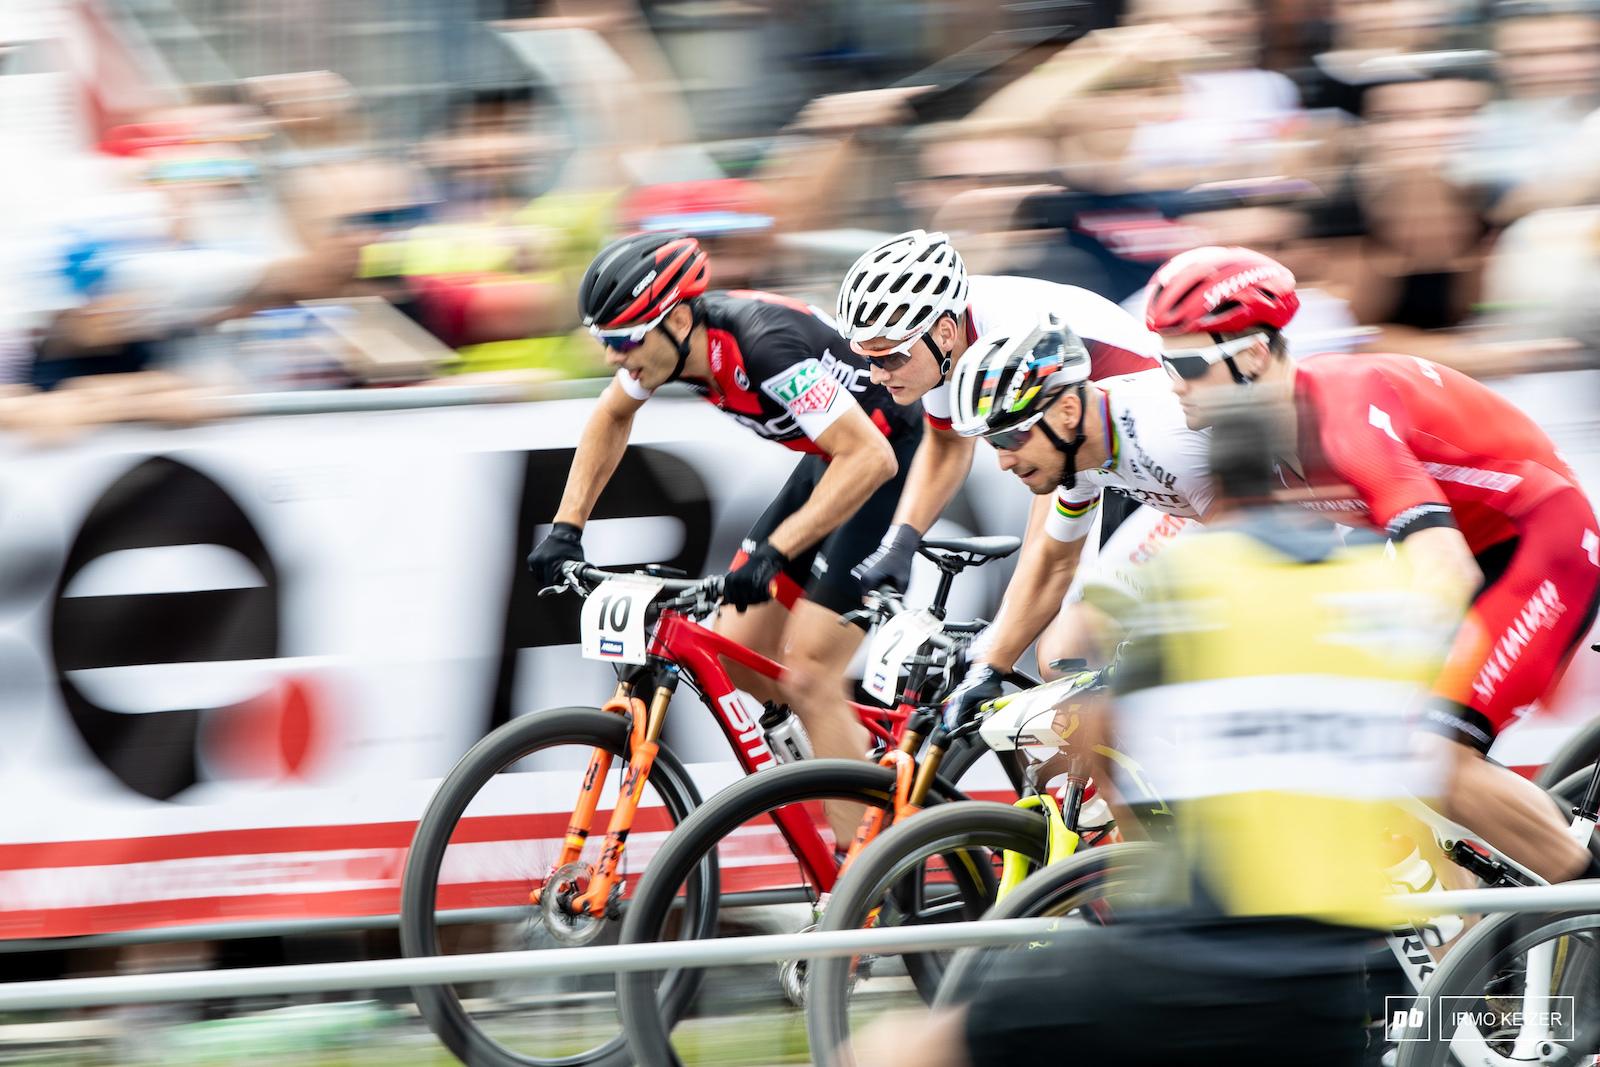 Gaze Schurter Van der Poel and Indergand take off.